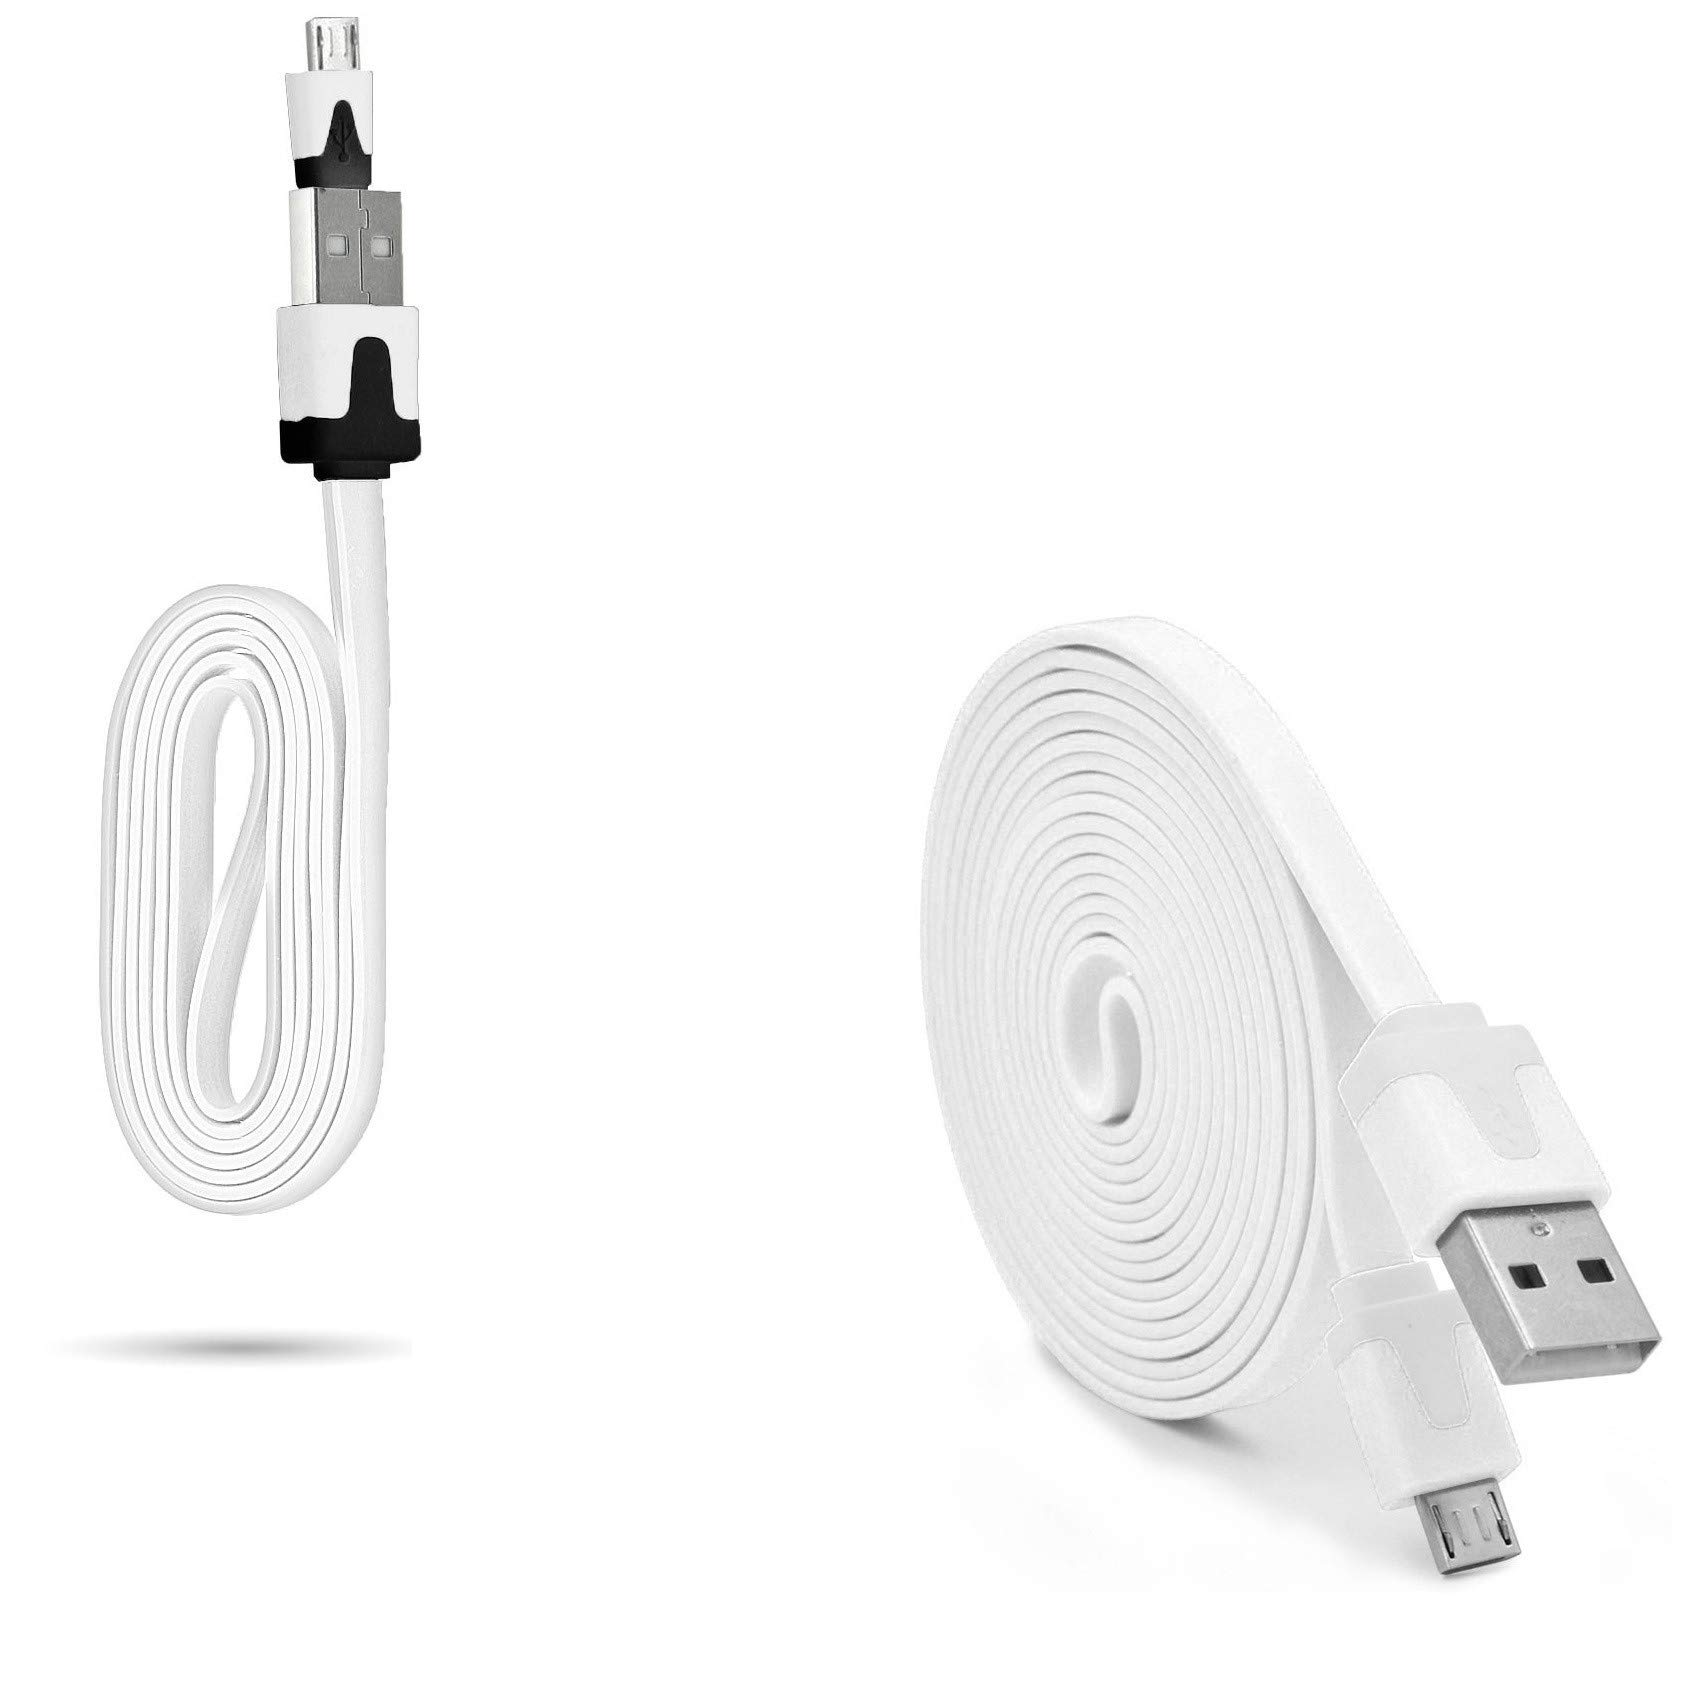 Pack Cargador para Microsoft Lumia 640 XL Smartphone Micro USB (Cable Noodle 3M + Cable Noodle de 1 m) Android (Blanco): Amazon.es: Electrónica